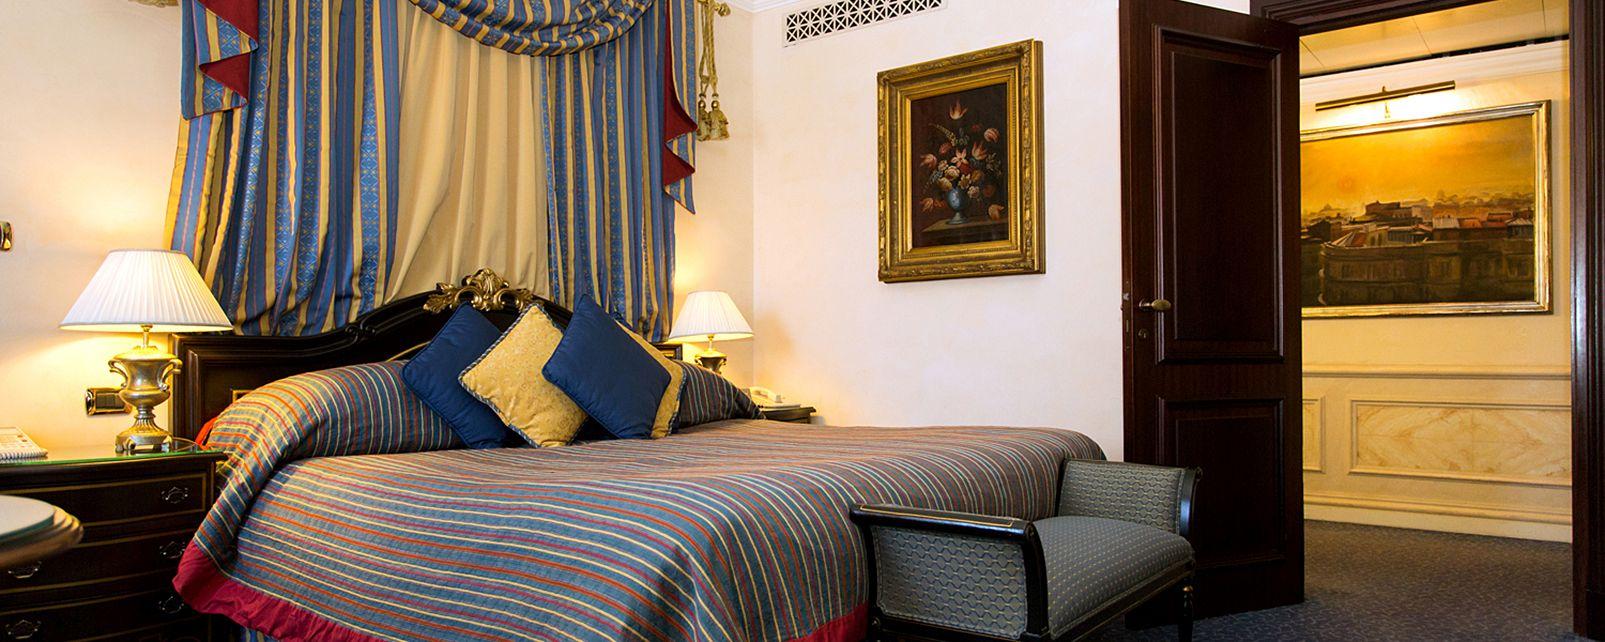 Hotel InterContinental De La Ville Roma